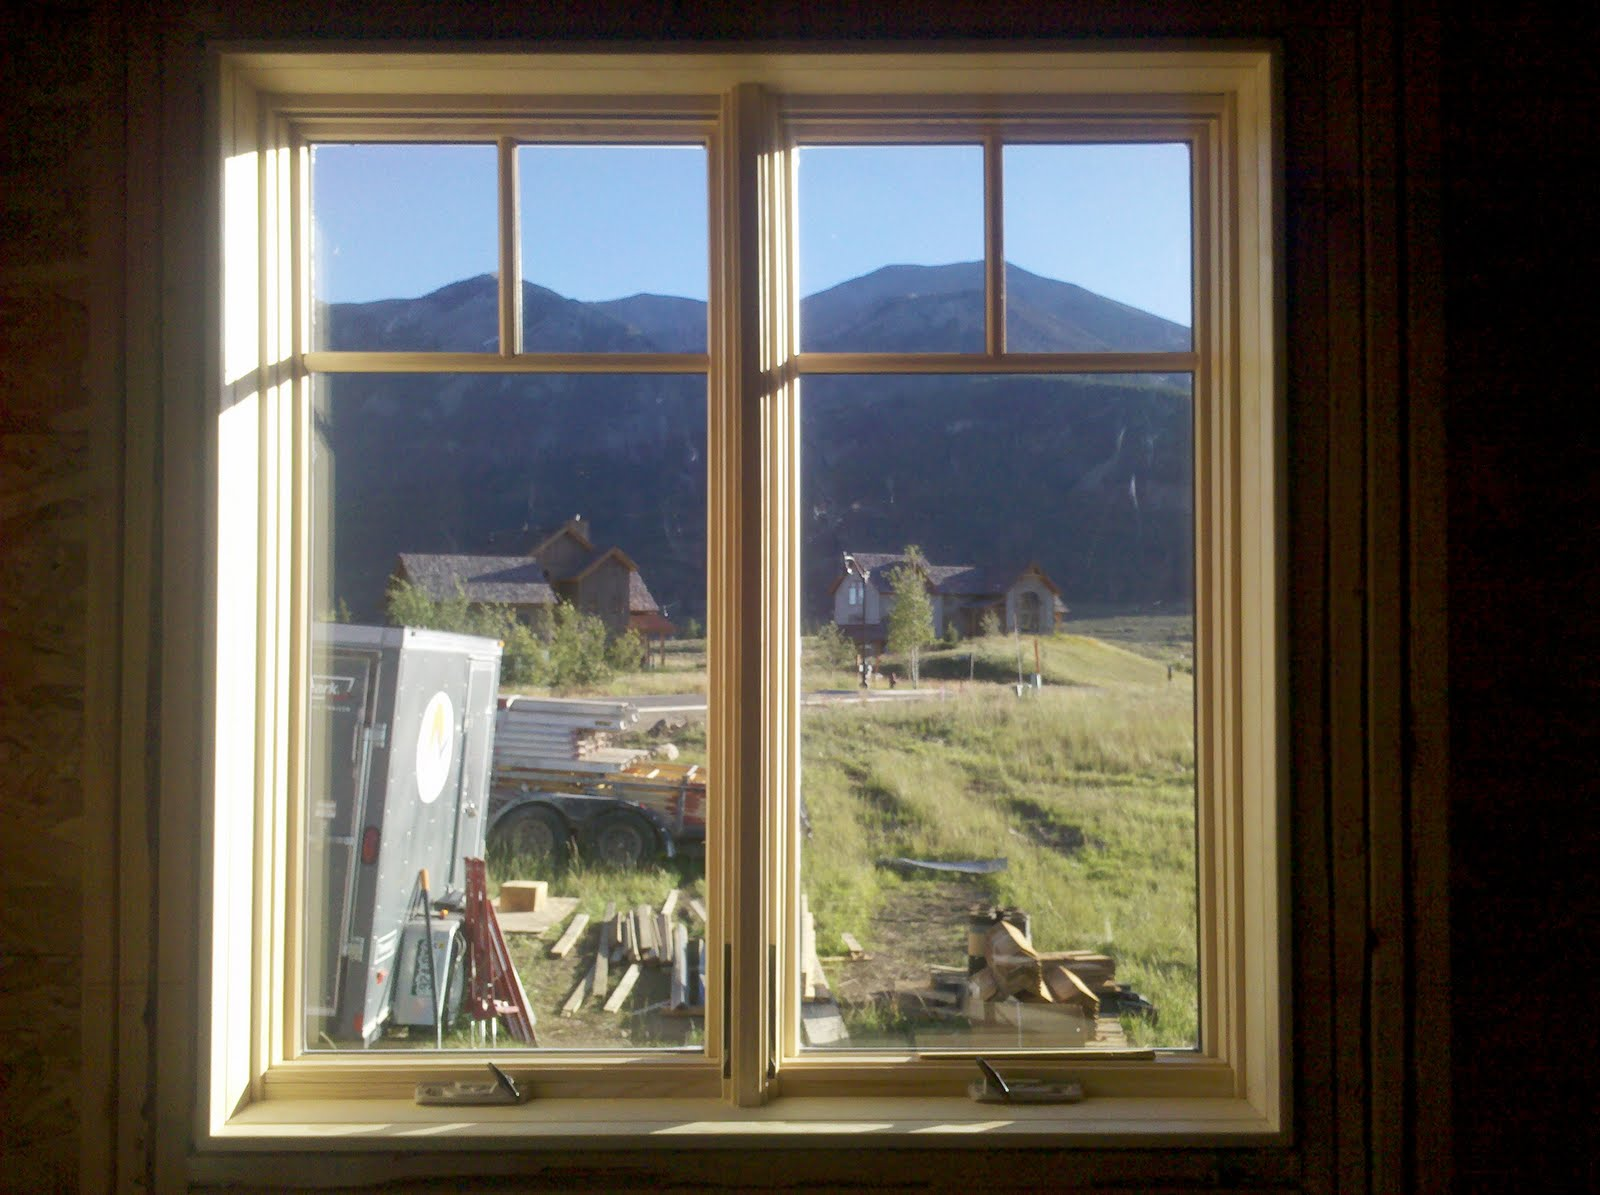 The Weyls In Crested Butte Windows Gardens Sept 3